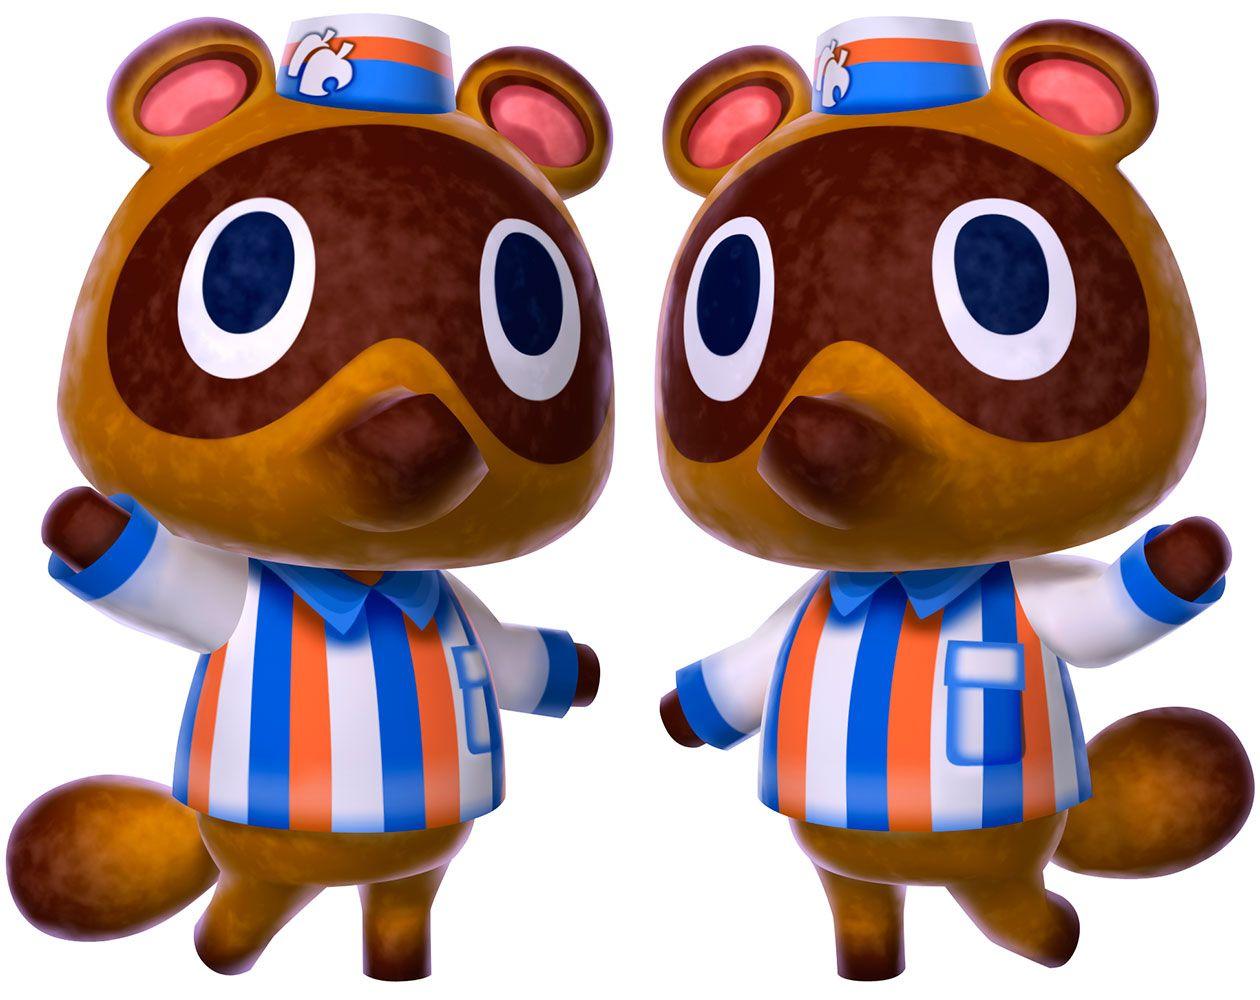 Timmy & Tommy (alt clothes) - Animal Crossing: New Leaf